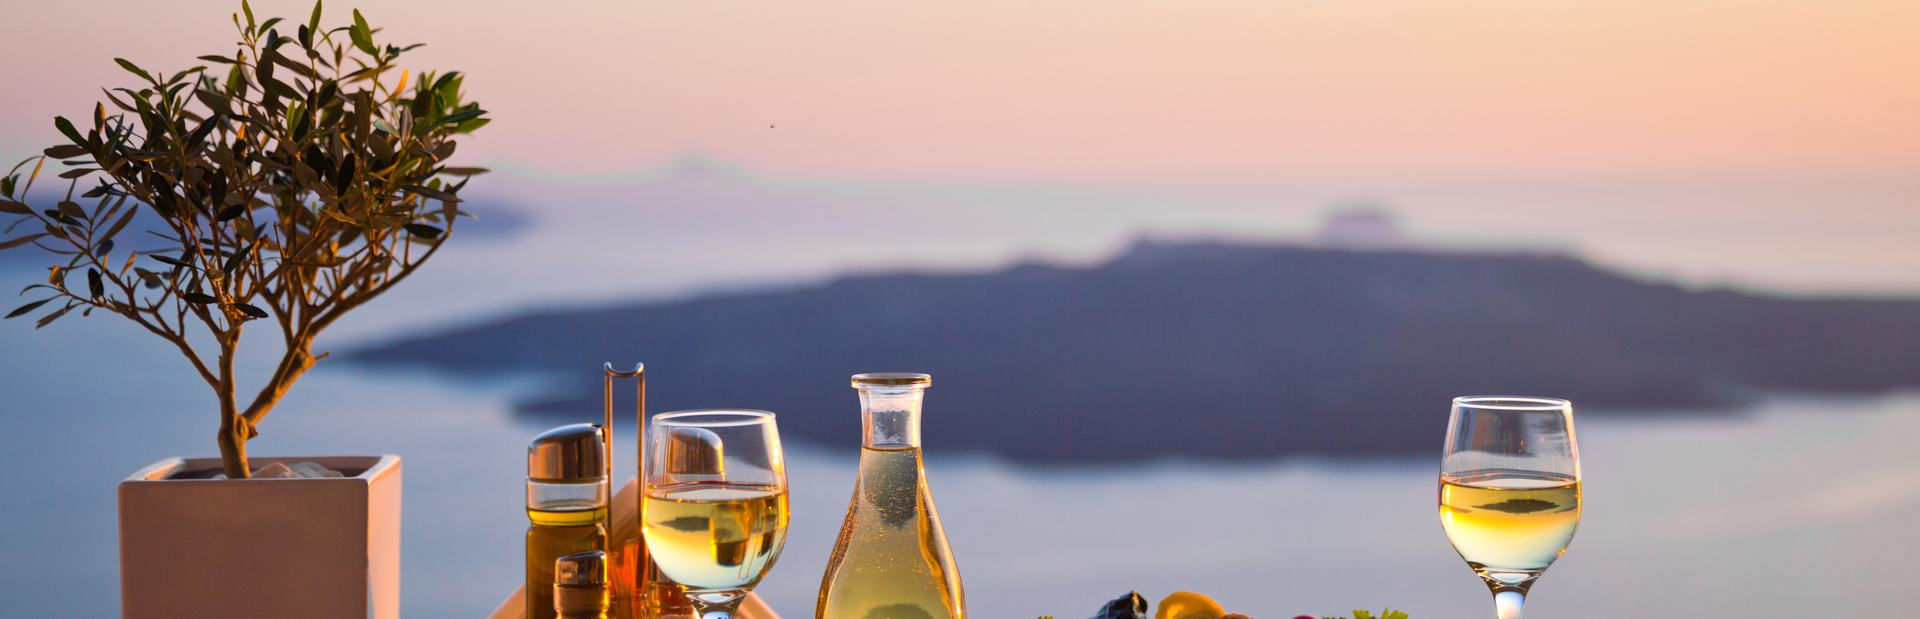 Eat & drink in the Mediterranean